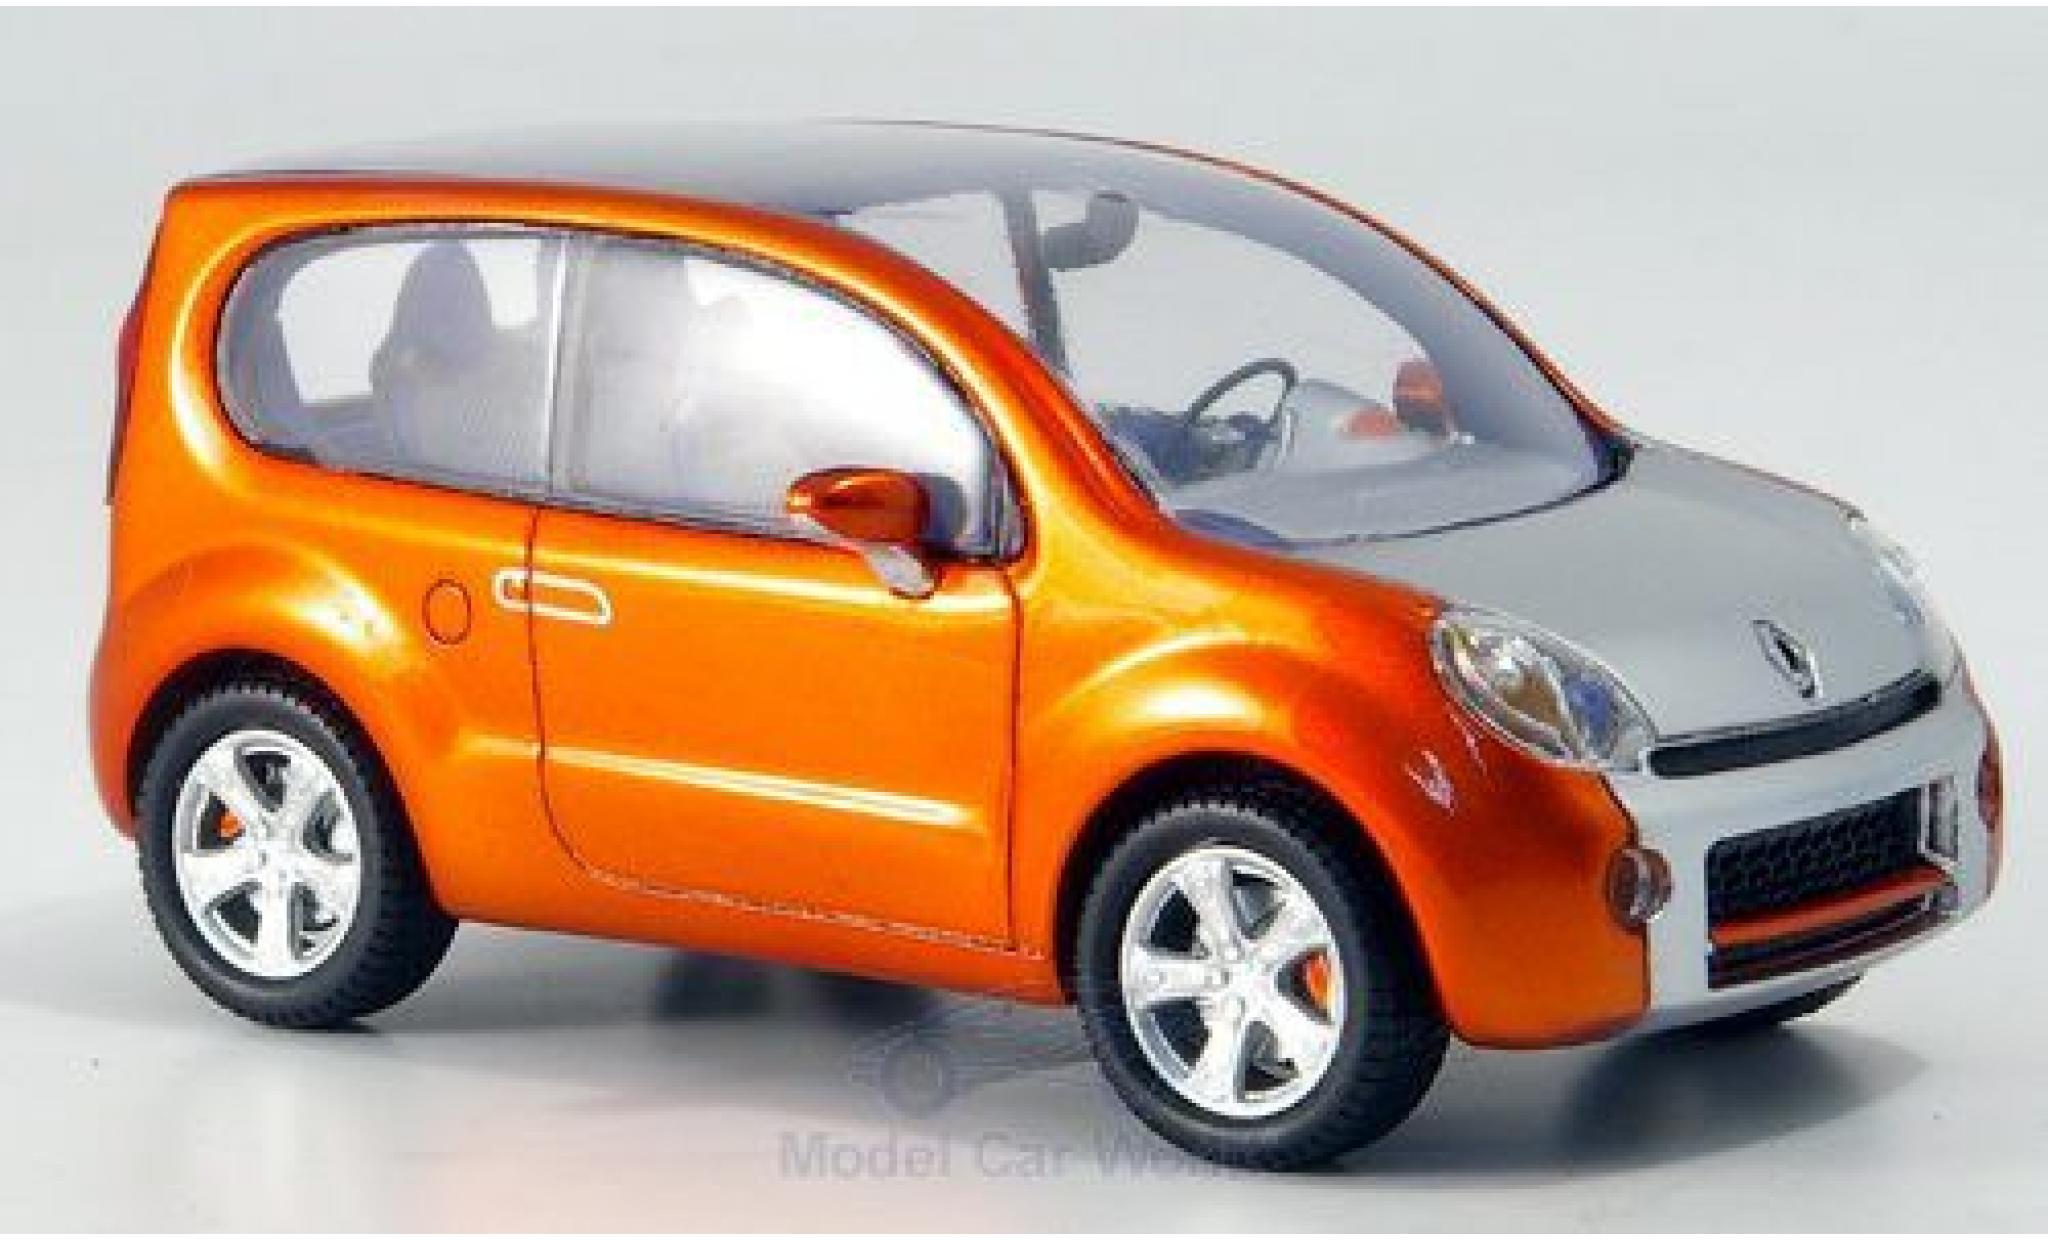 Renault Kangoo 1/43 Provence Moulage Compact Concept 2007 IAA Frankfurt